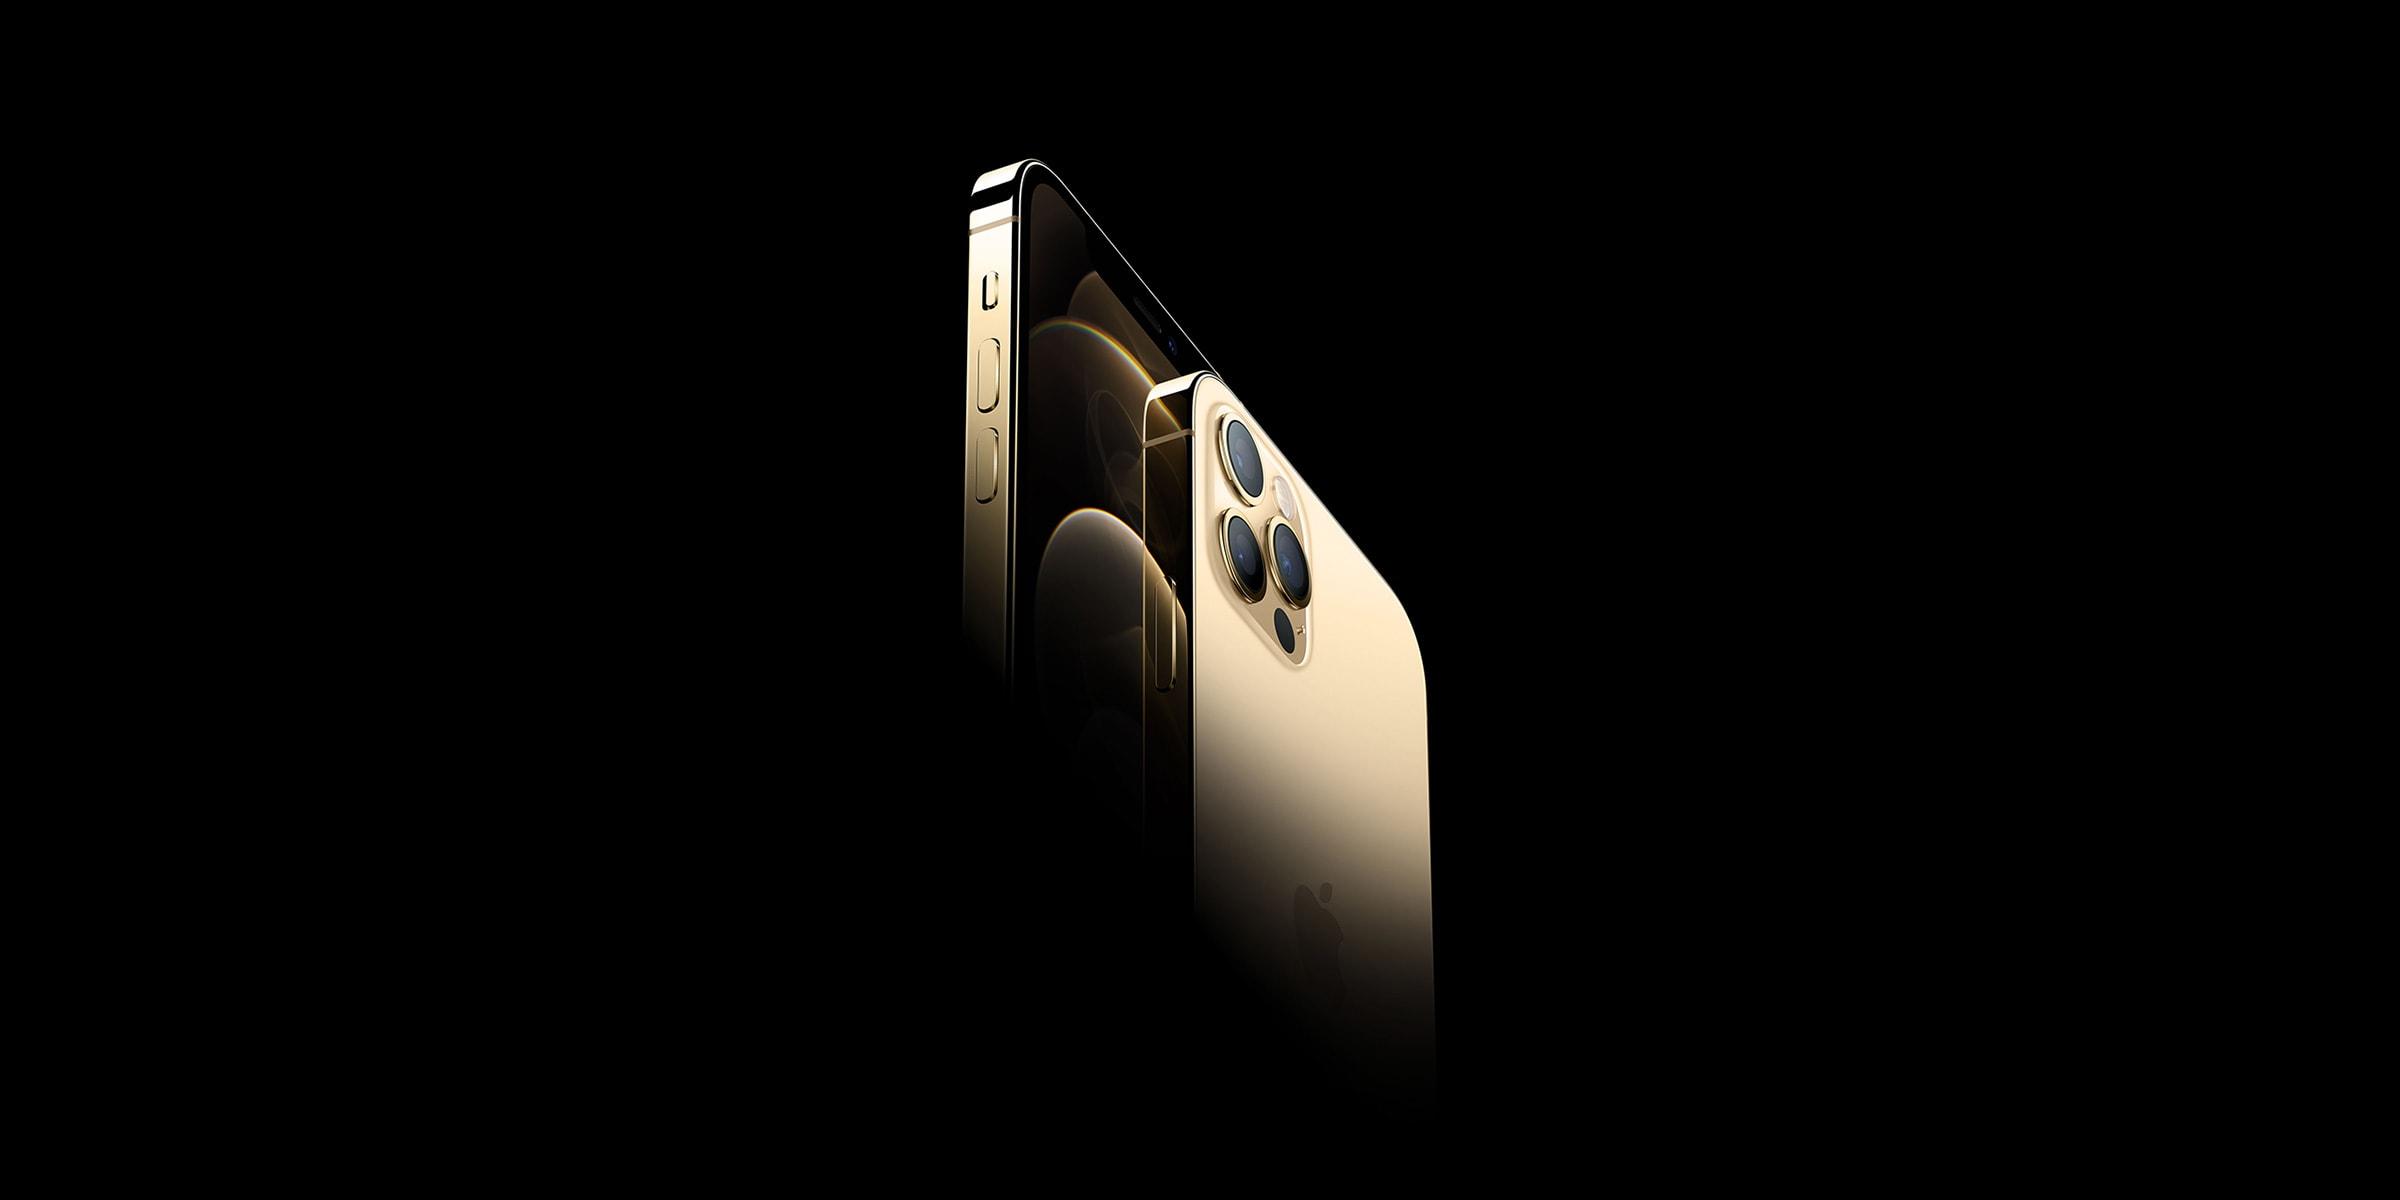 best iphone case apple - Luxe Digital